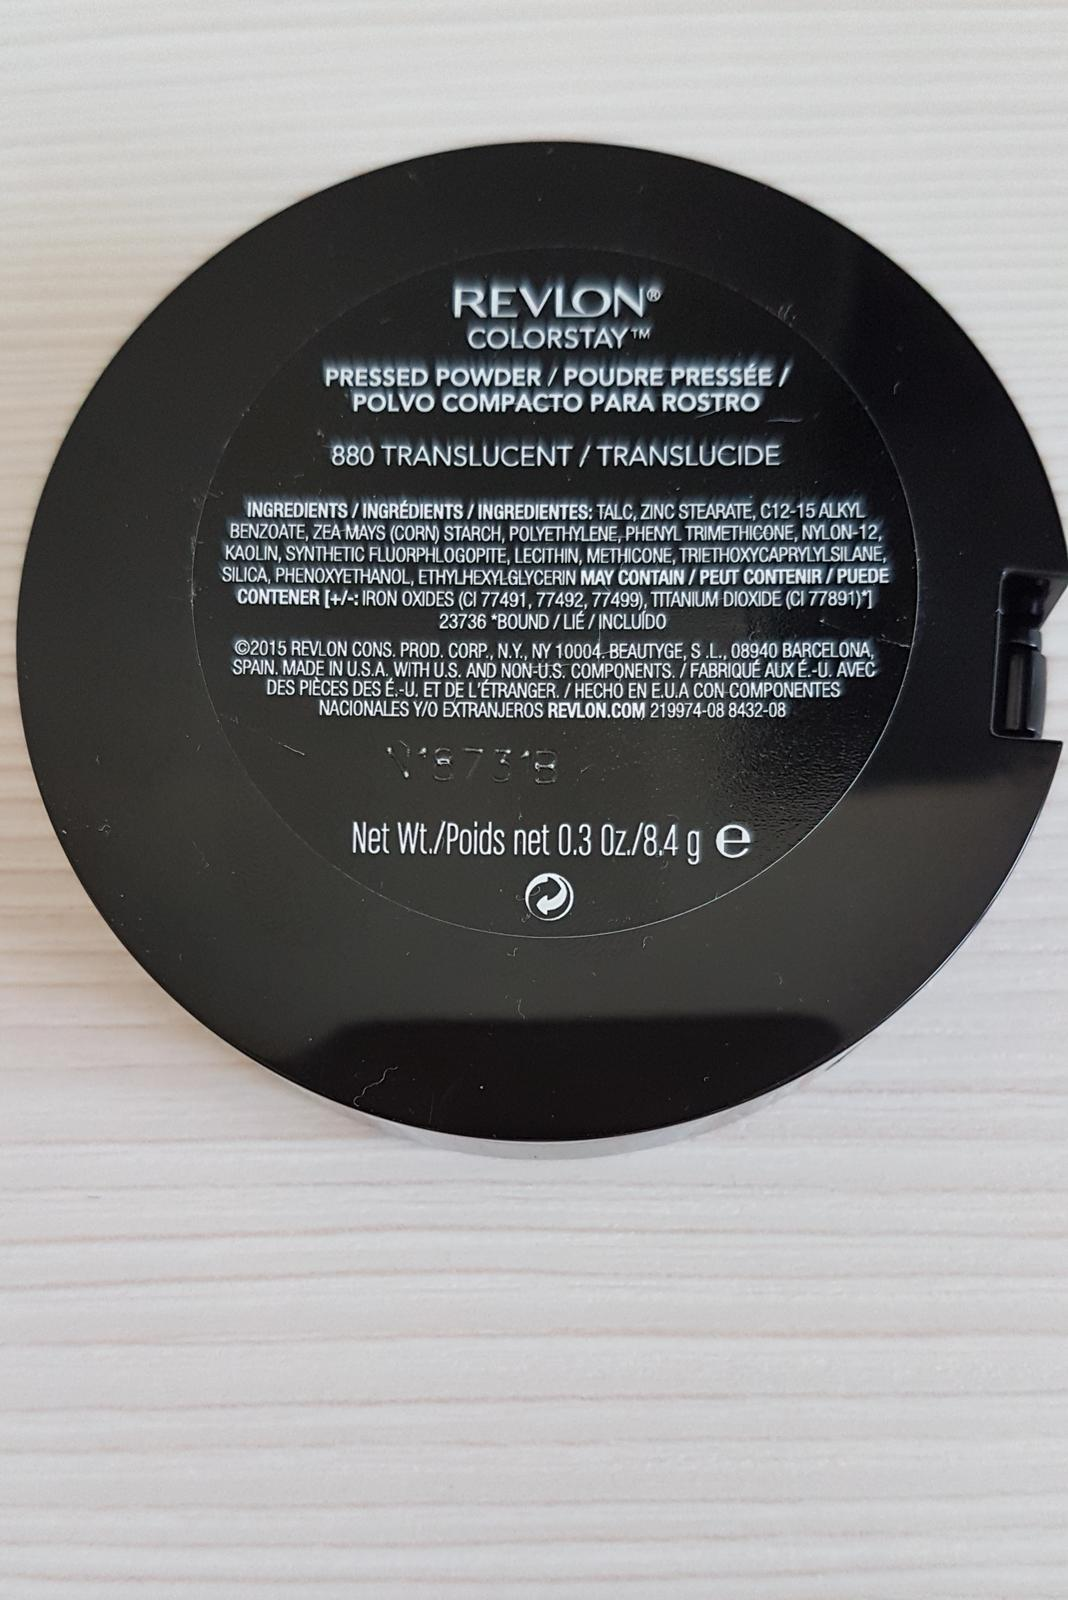 Puder Revlon - Obrázok č. 2